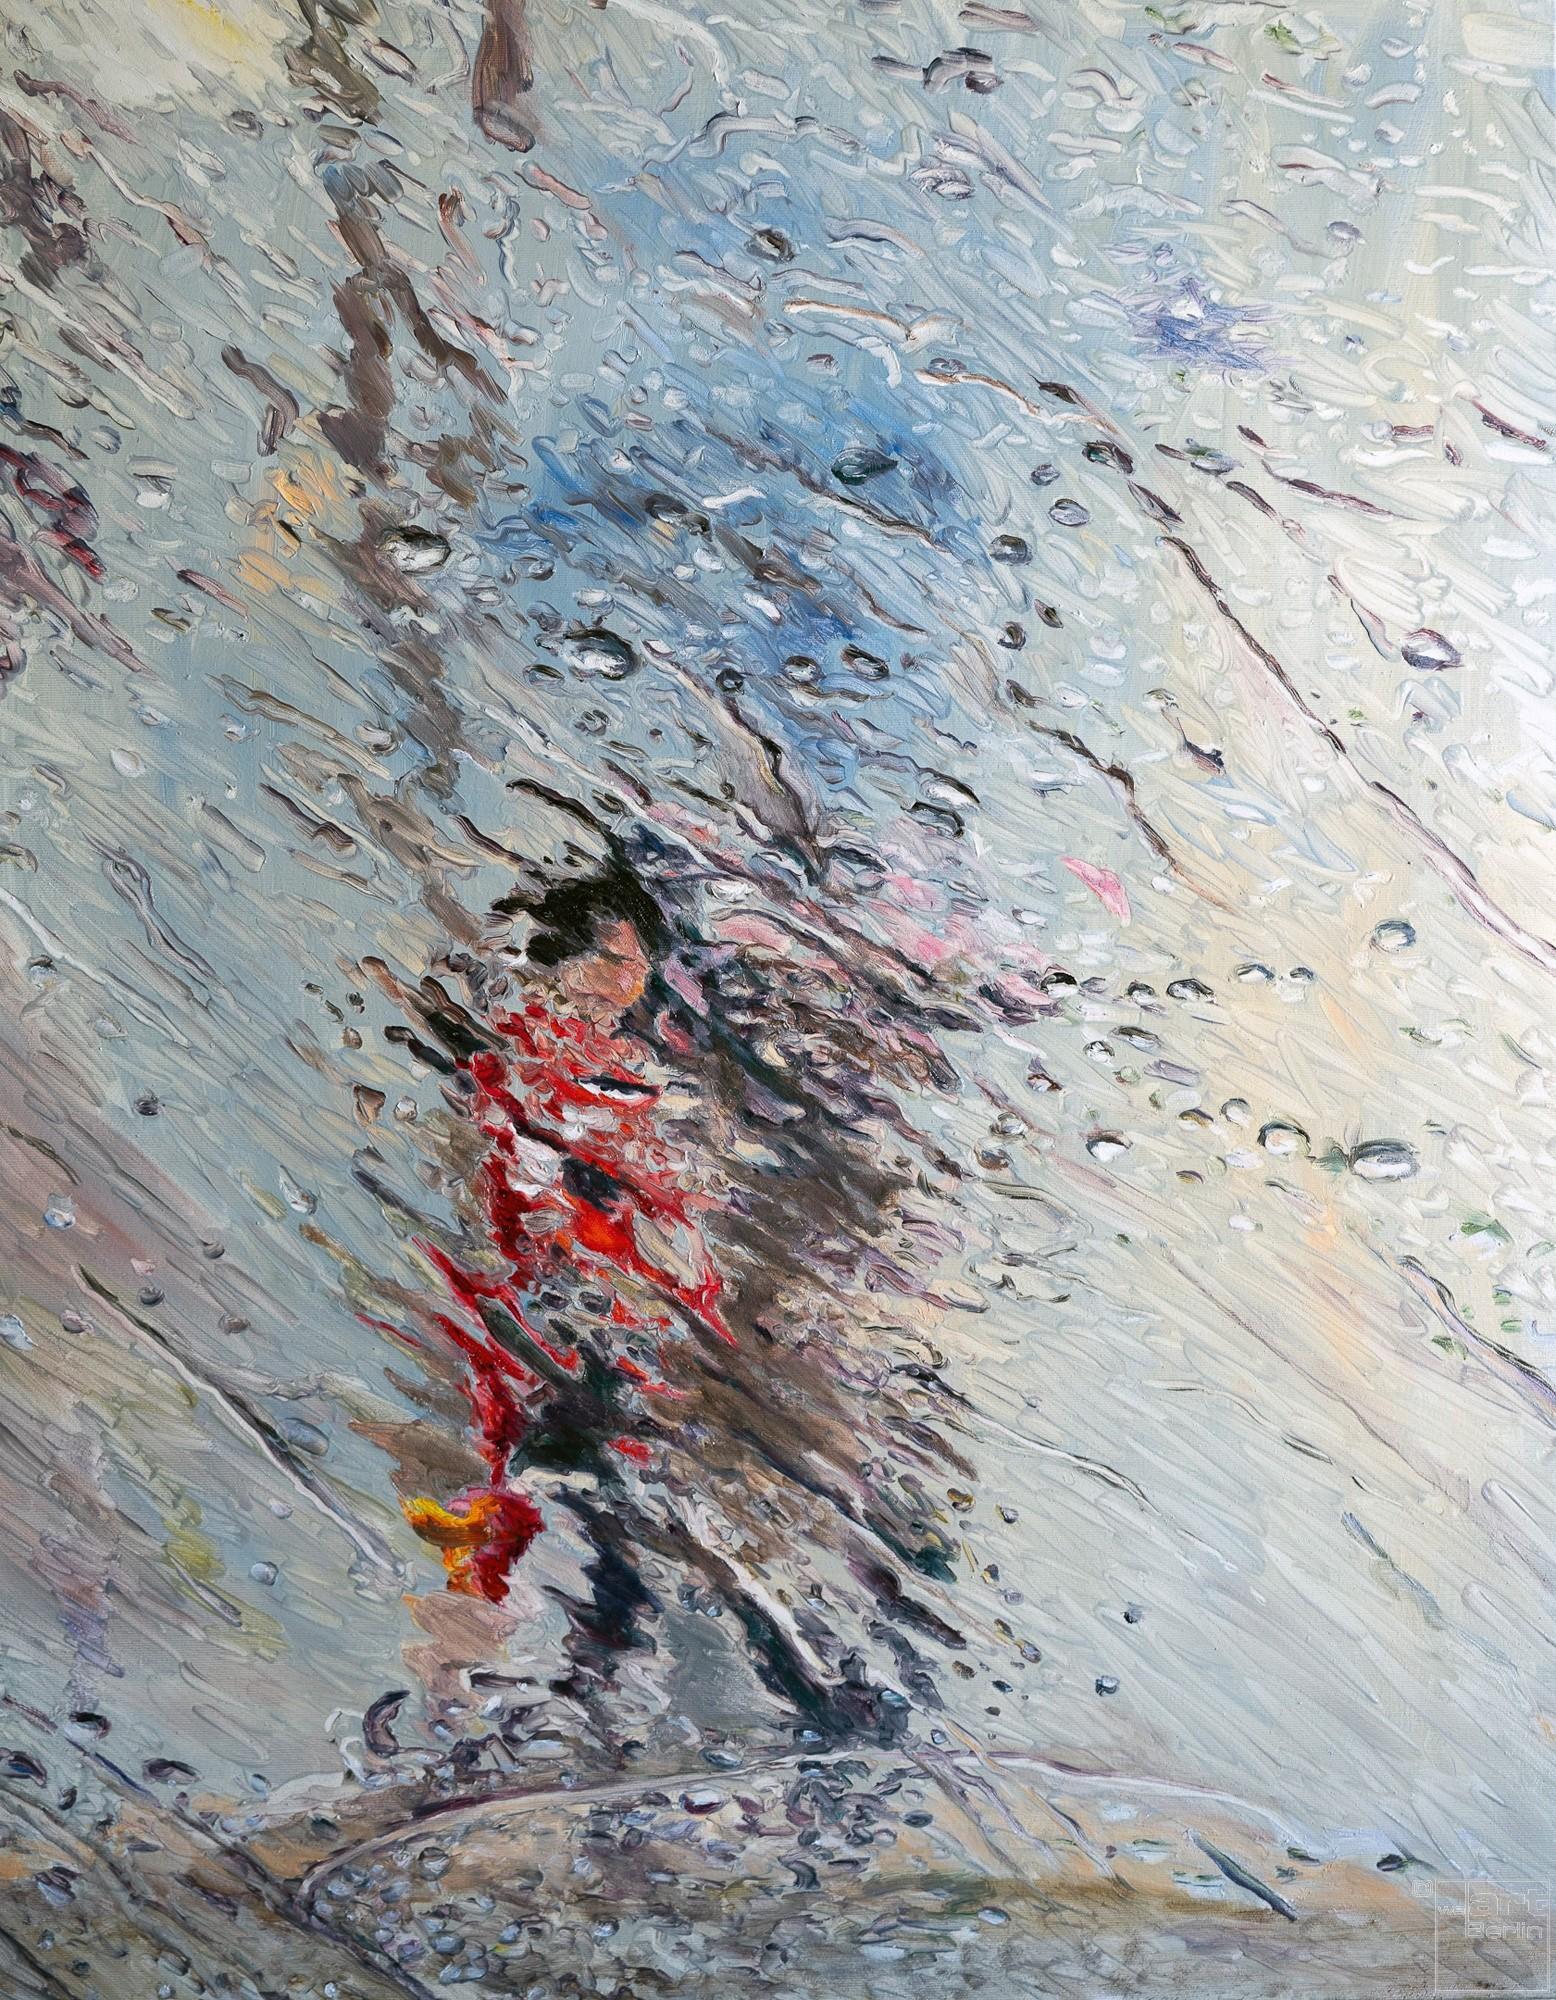 Fluid | Malerei von Künstlerin Simone Westphal, Öl auf Leinwand